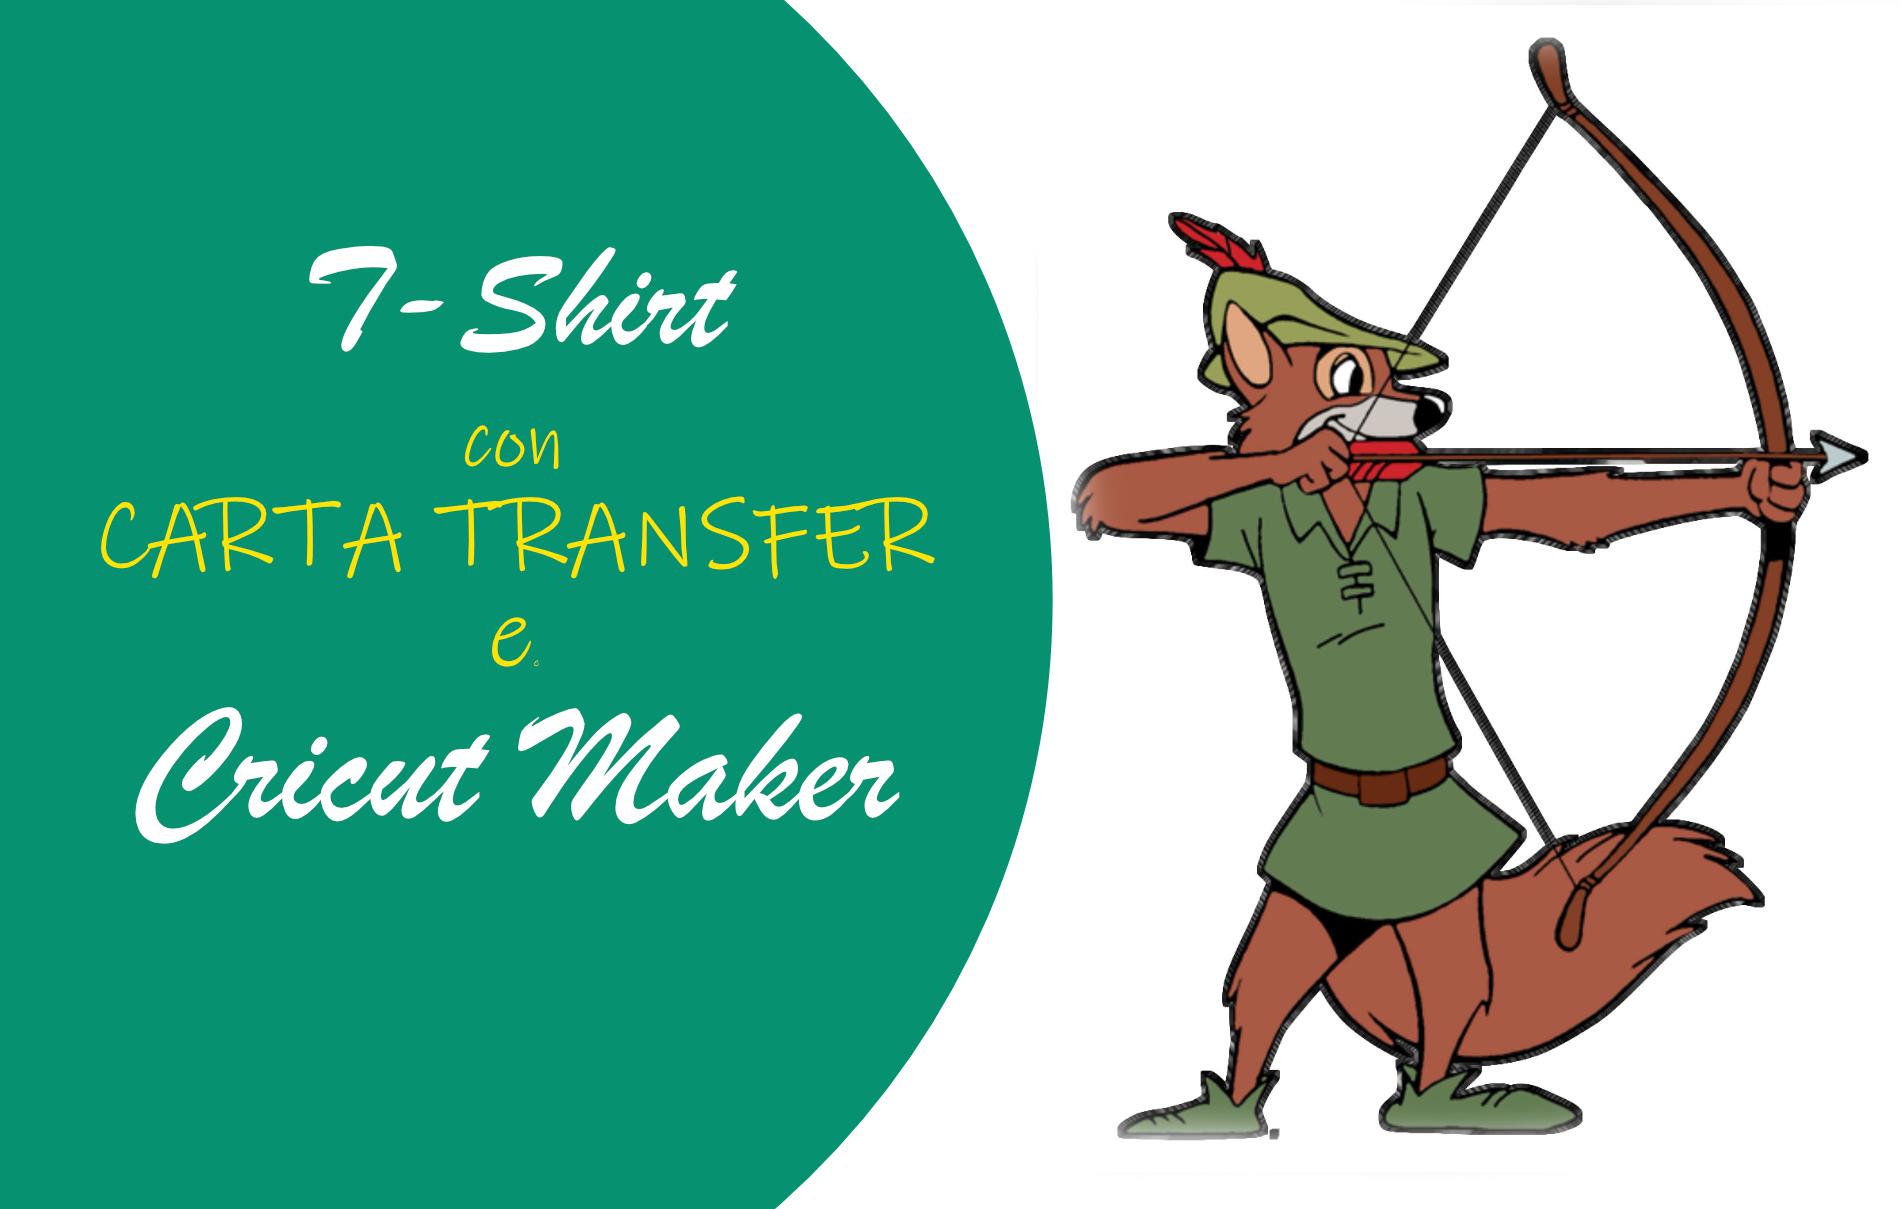 carta transfer cricut